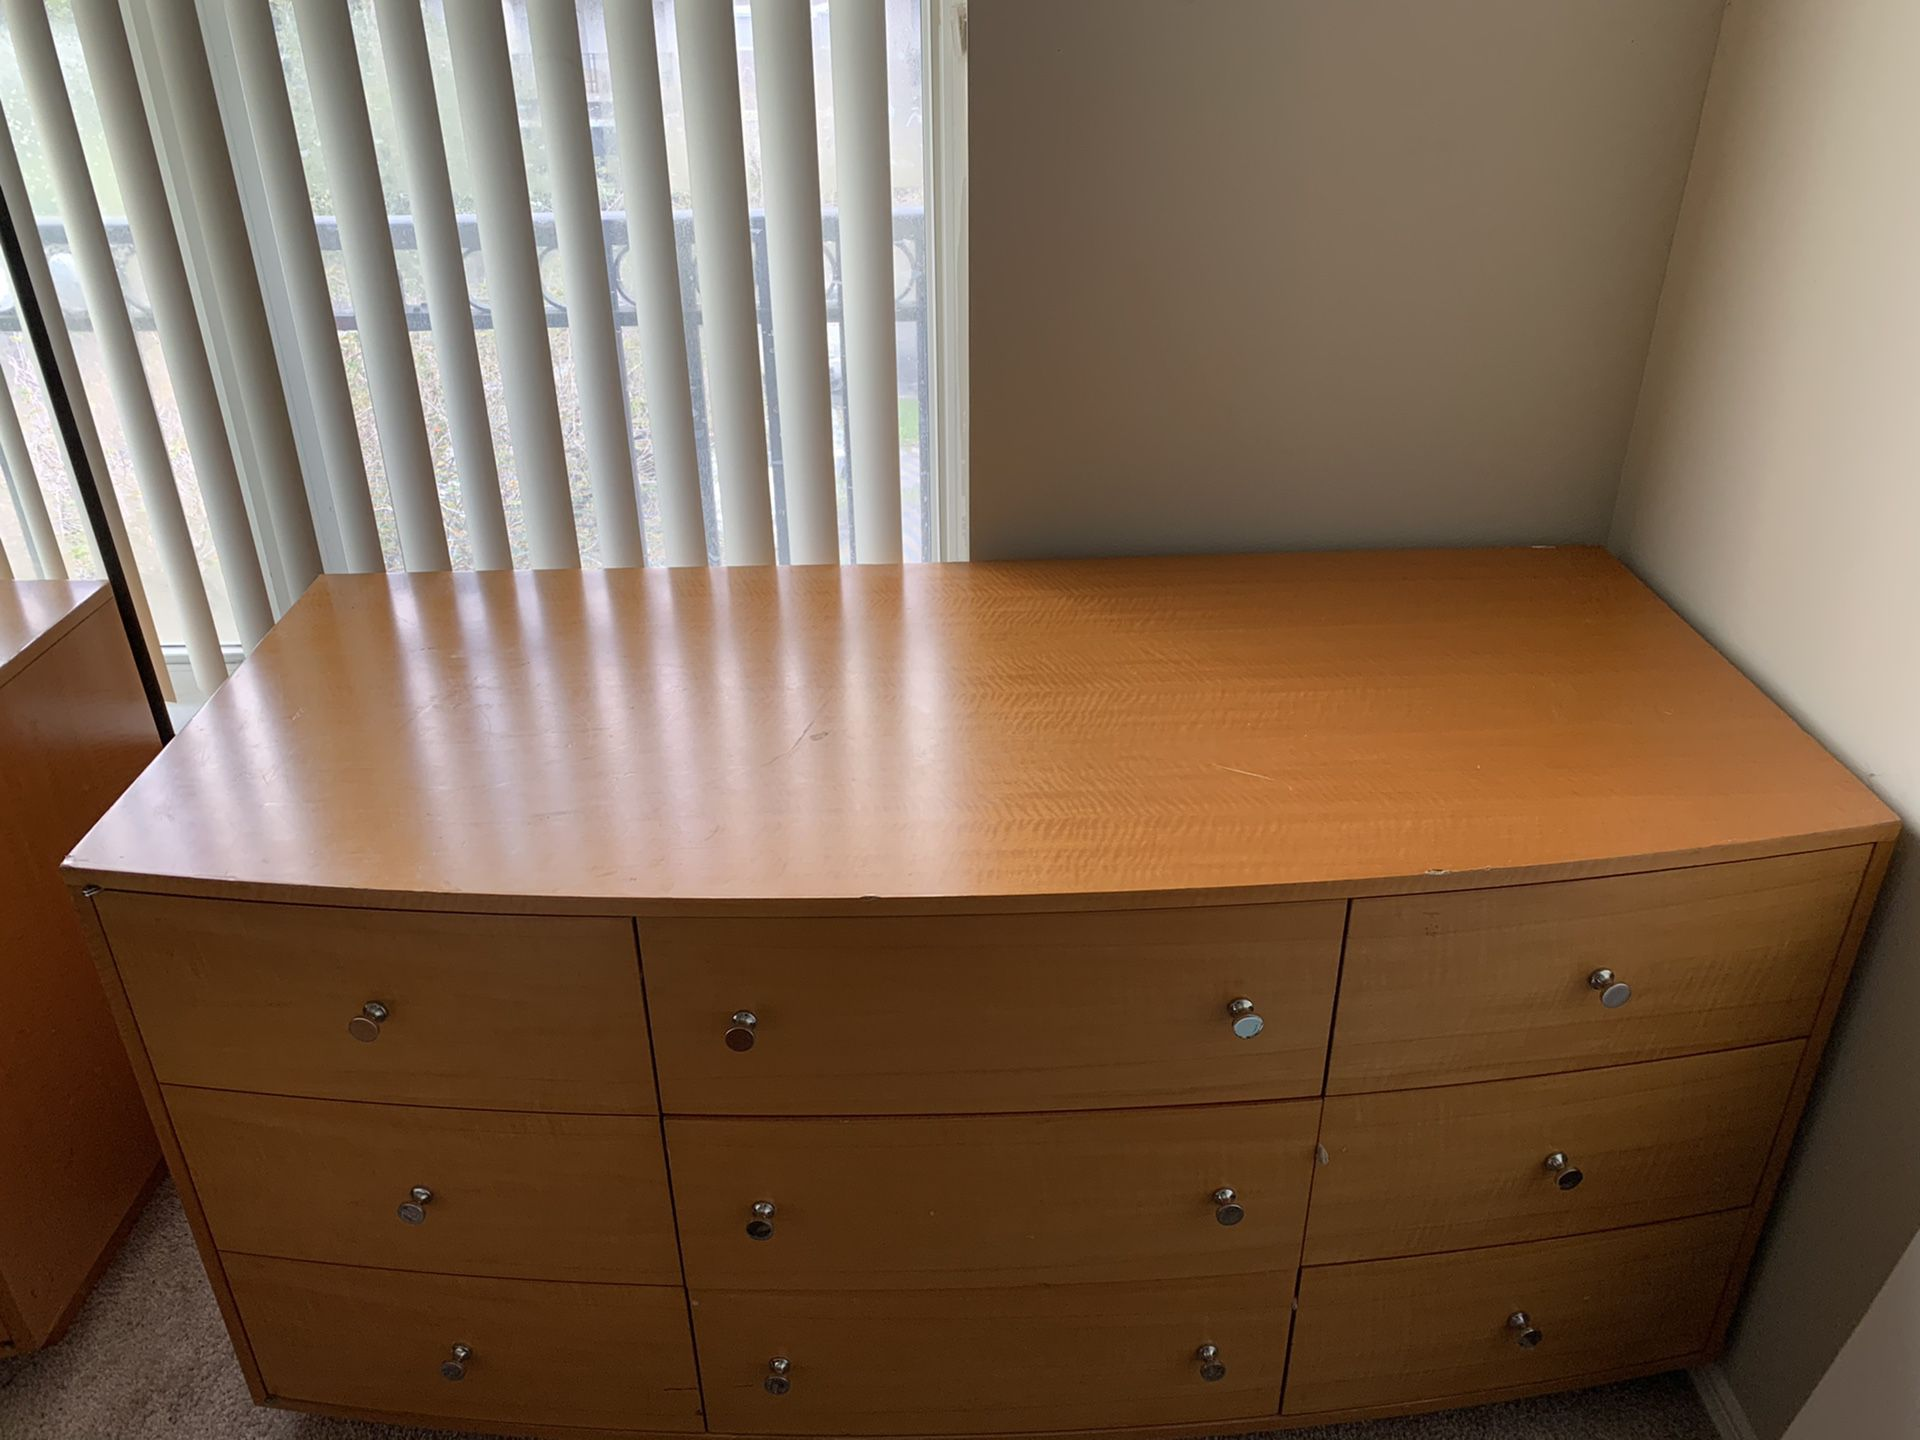 2 Wooden 7 piece dressers